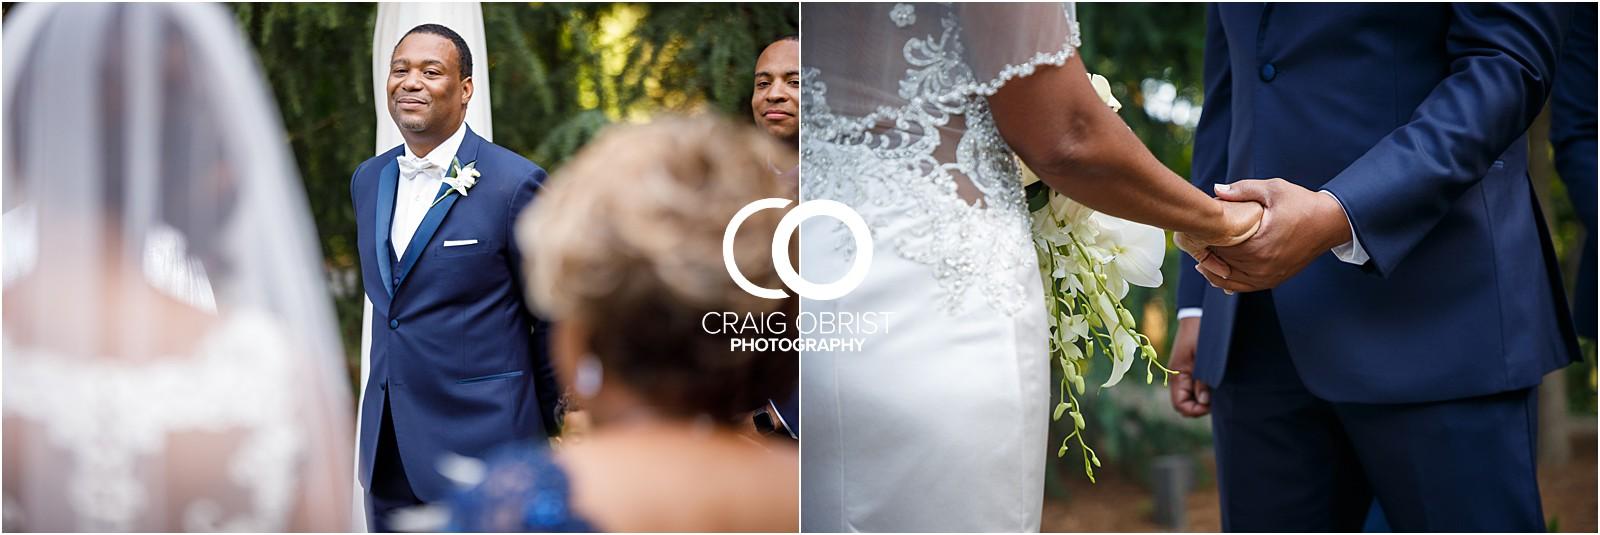 Villa Christina Atlanta Wedding Photographer_0056.jpg